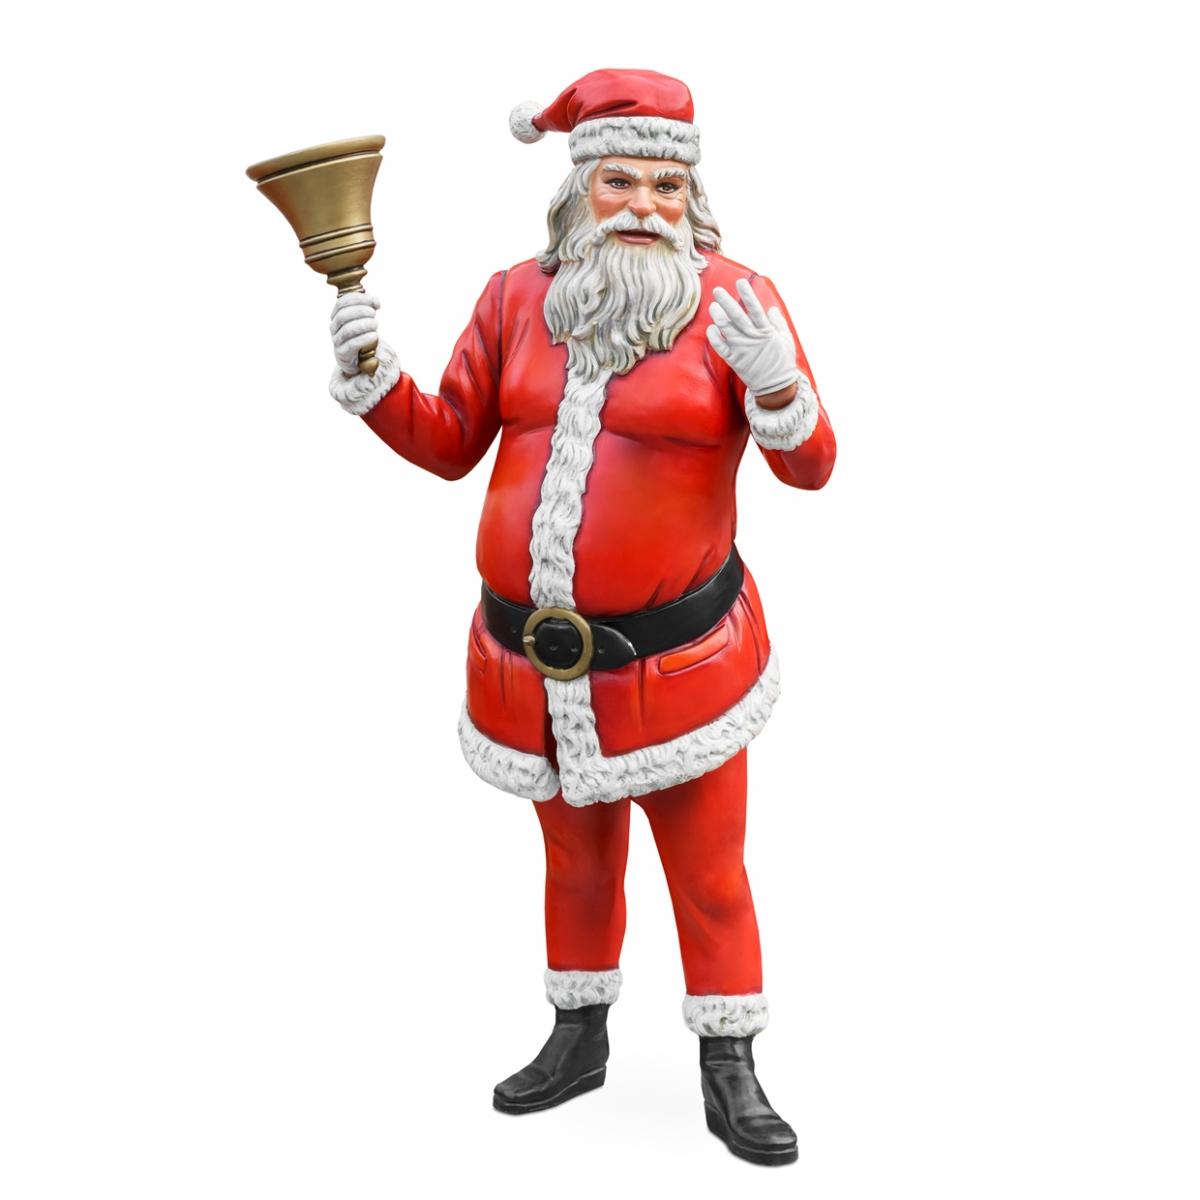 Imagen en la que se ve a Papá Noel